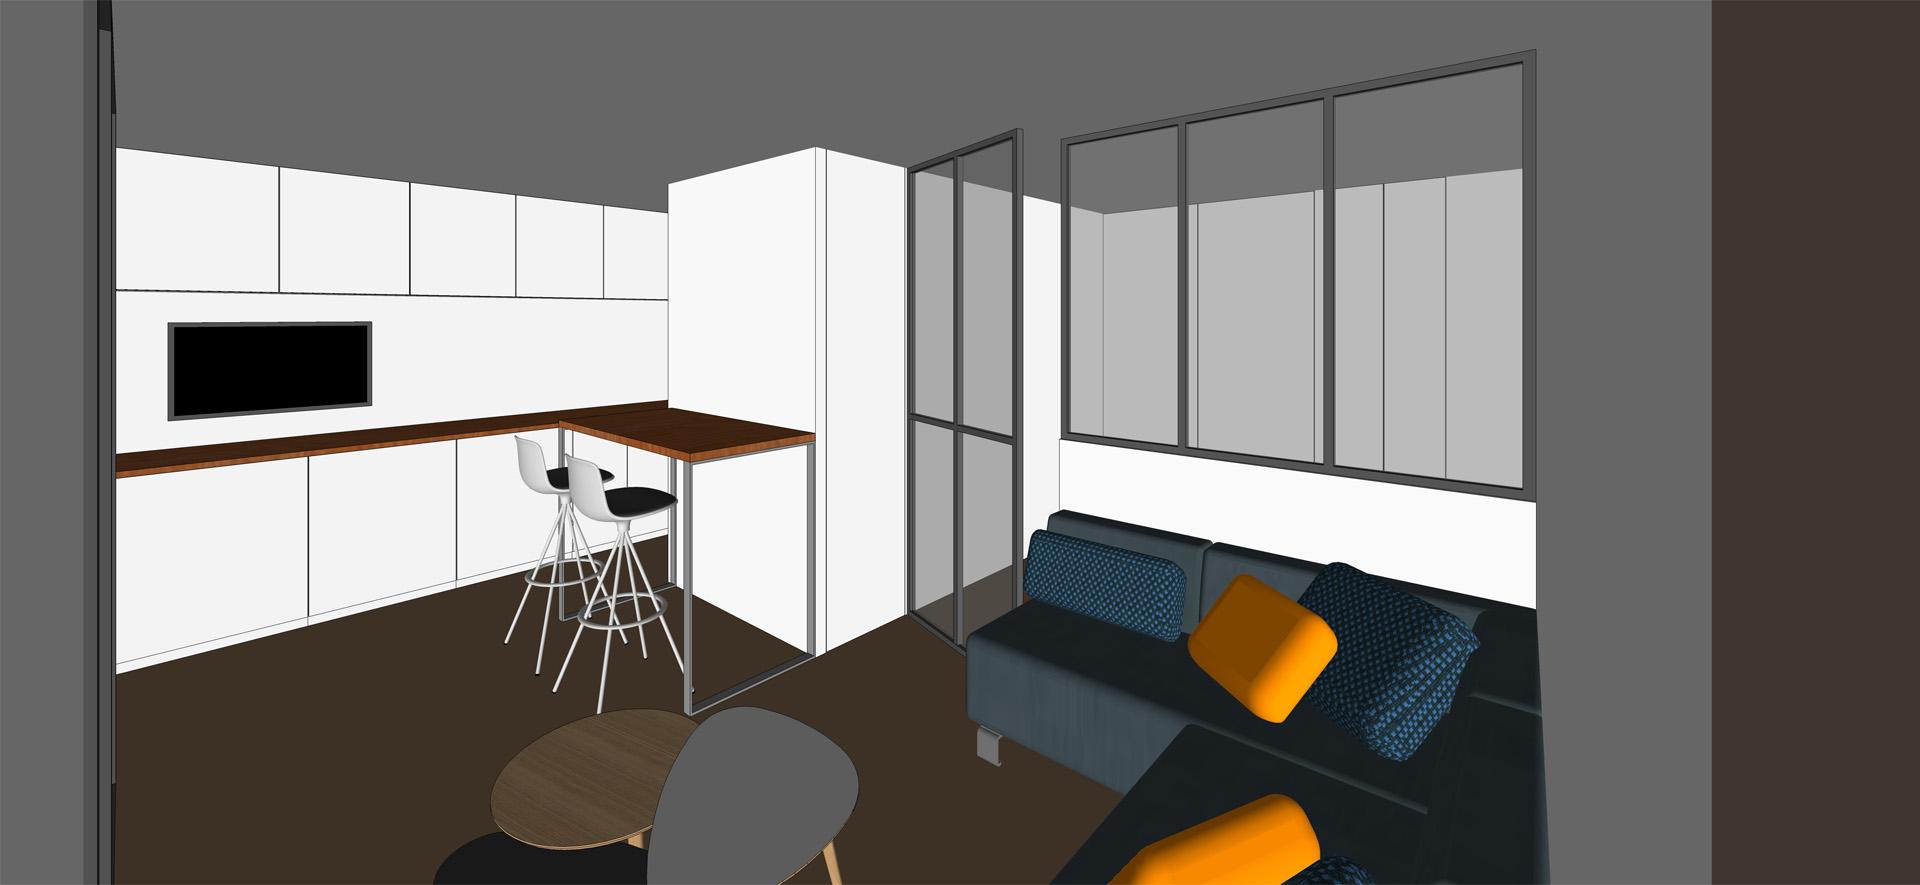 immeuble c lhenry architecture. Black Bedroom Furniture Sets. Home Design Ideas